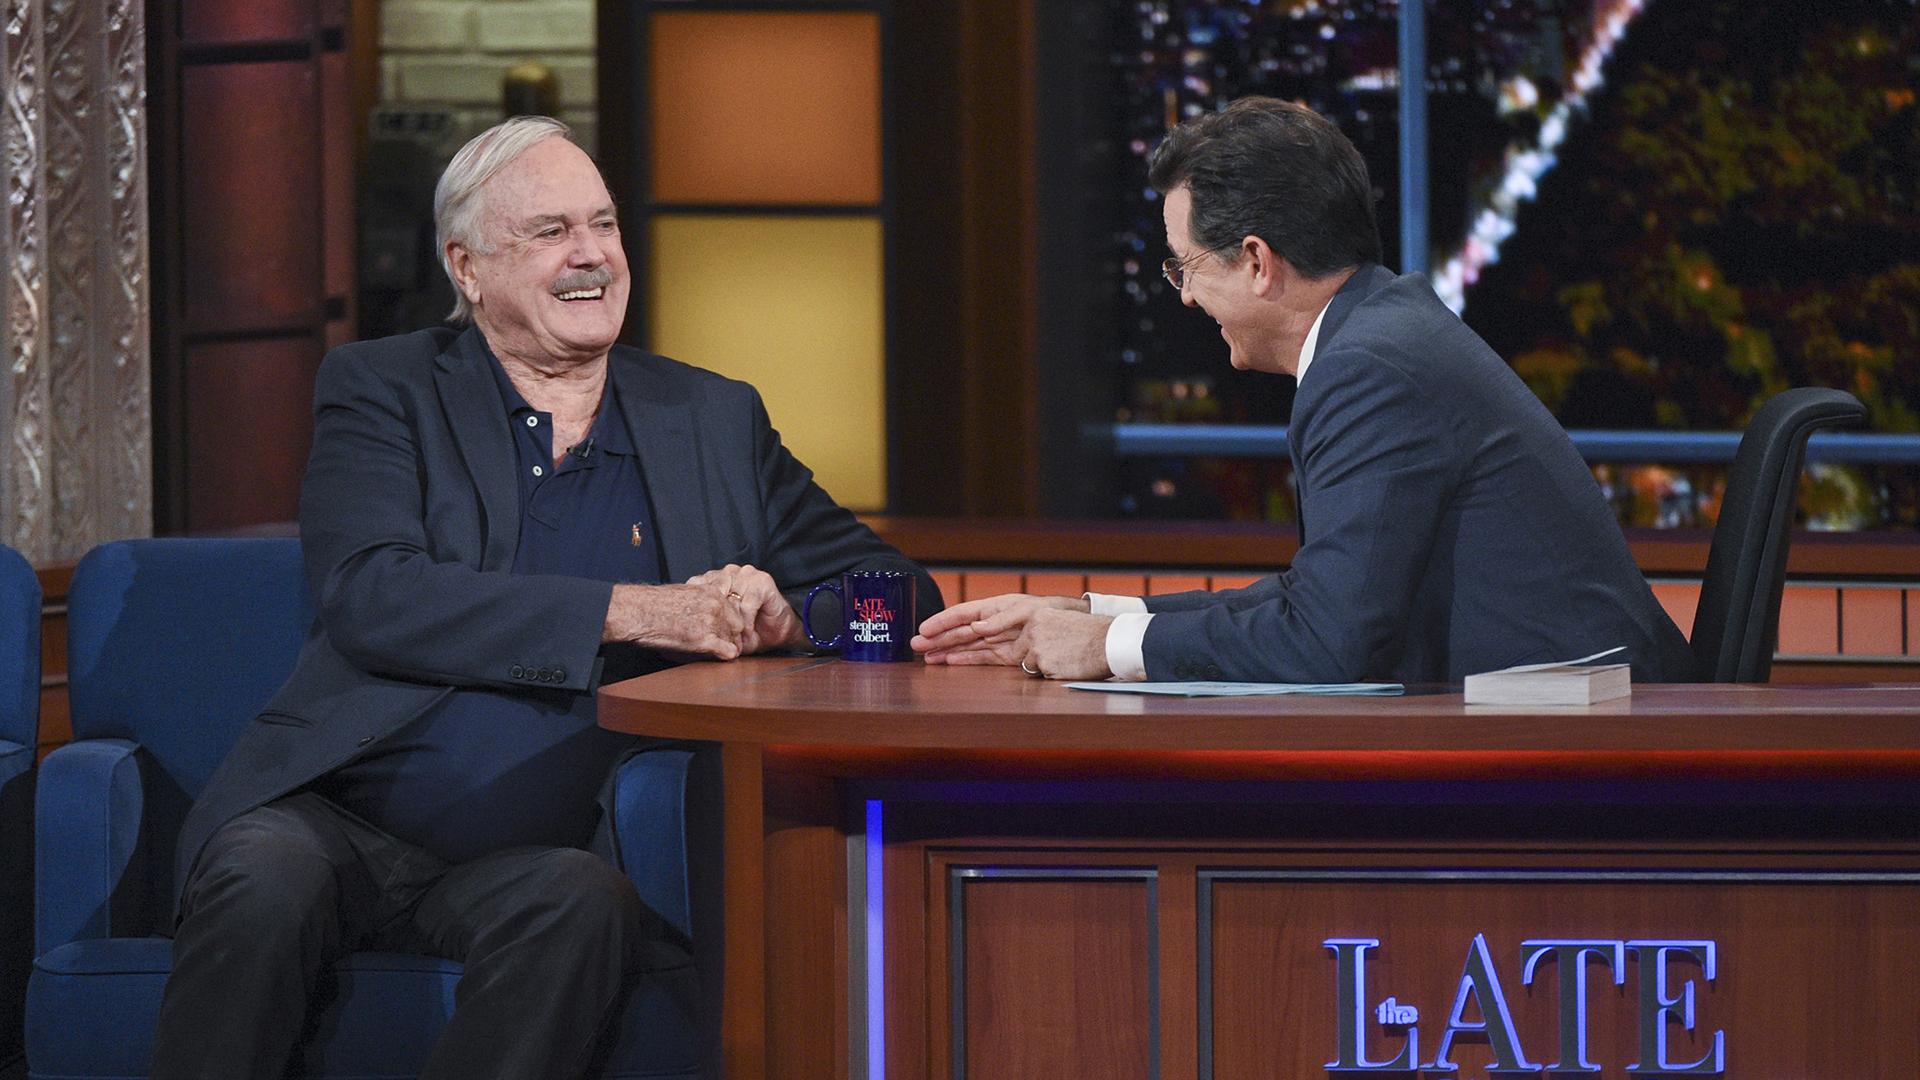 John Cleese and Stephen Colbert